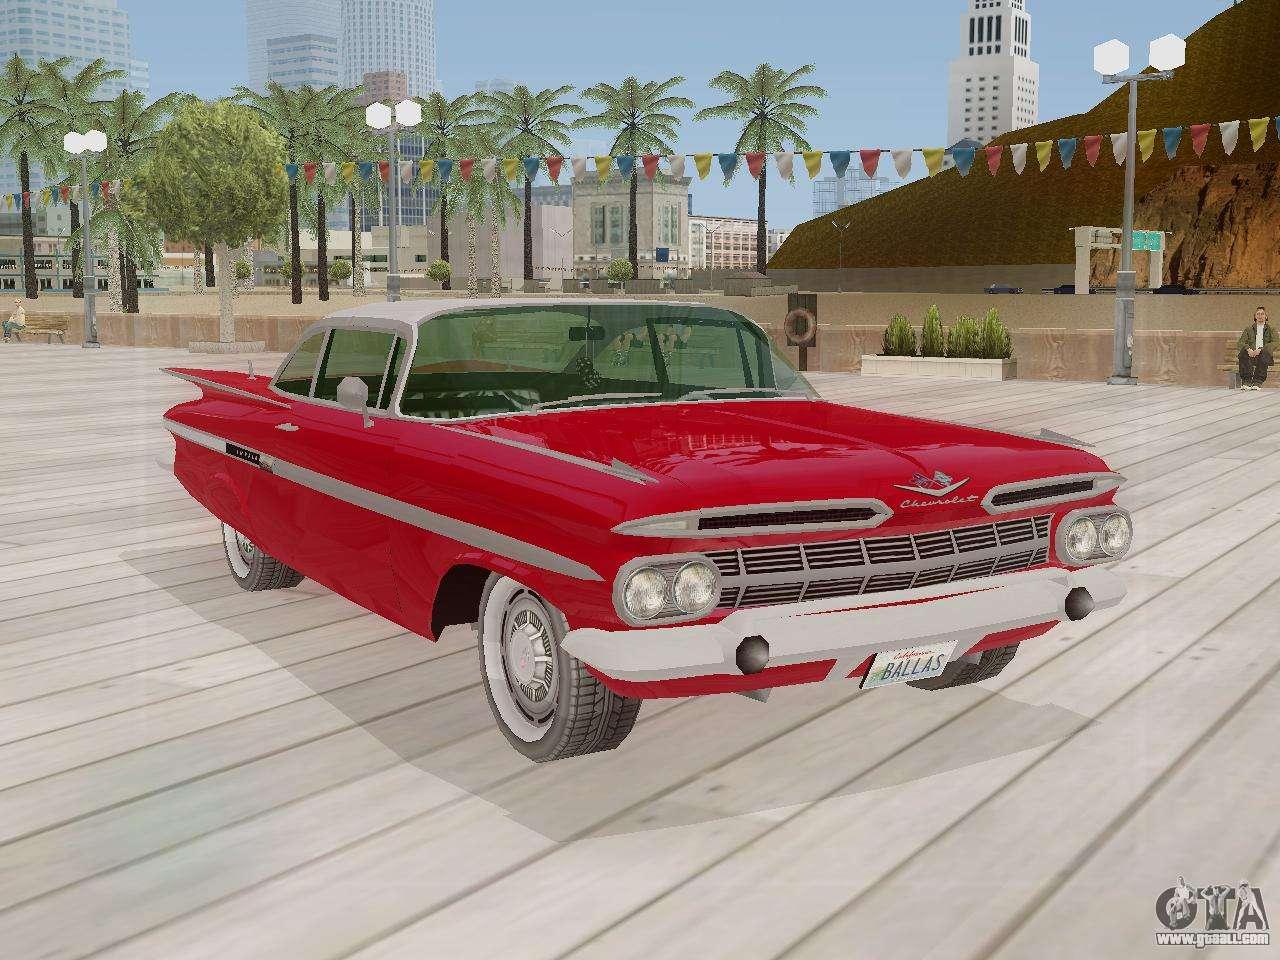 Chevrolet impala 4 door hardtop 1963 for gta san andreas - Chevrolet Impala 1959 For Gta San Andreas